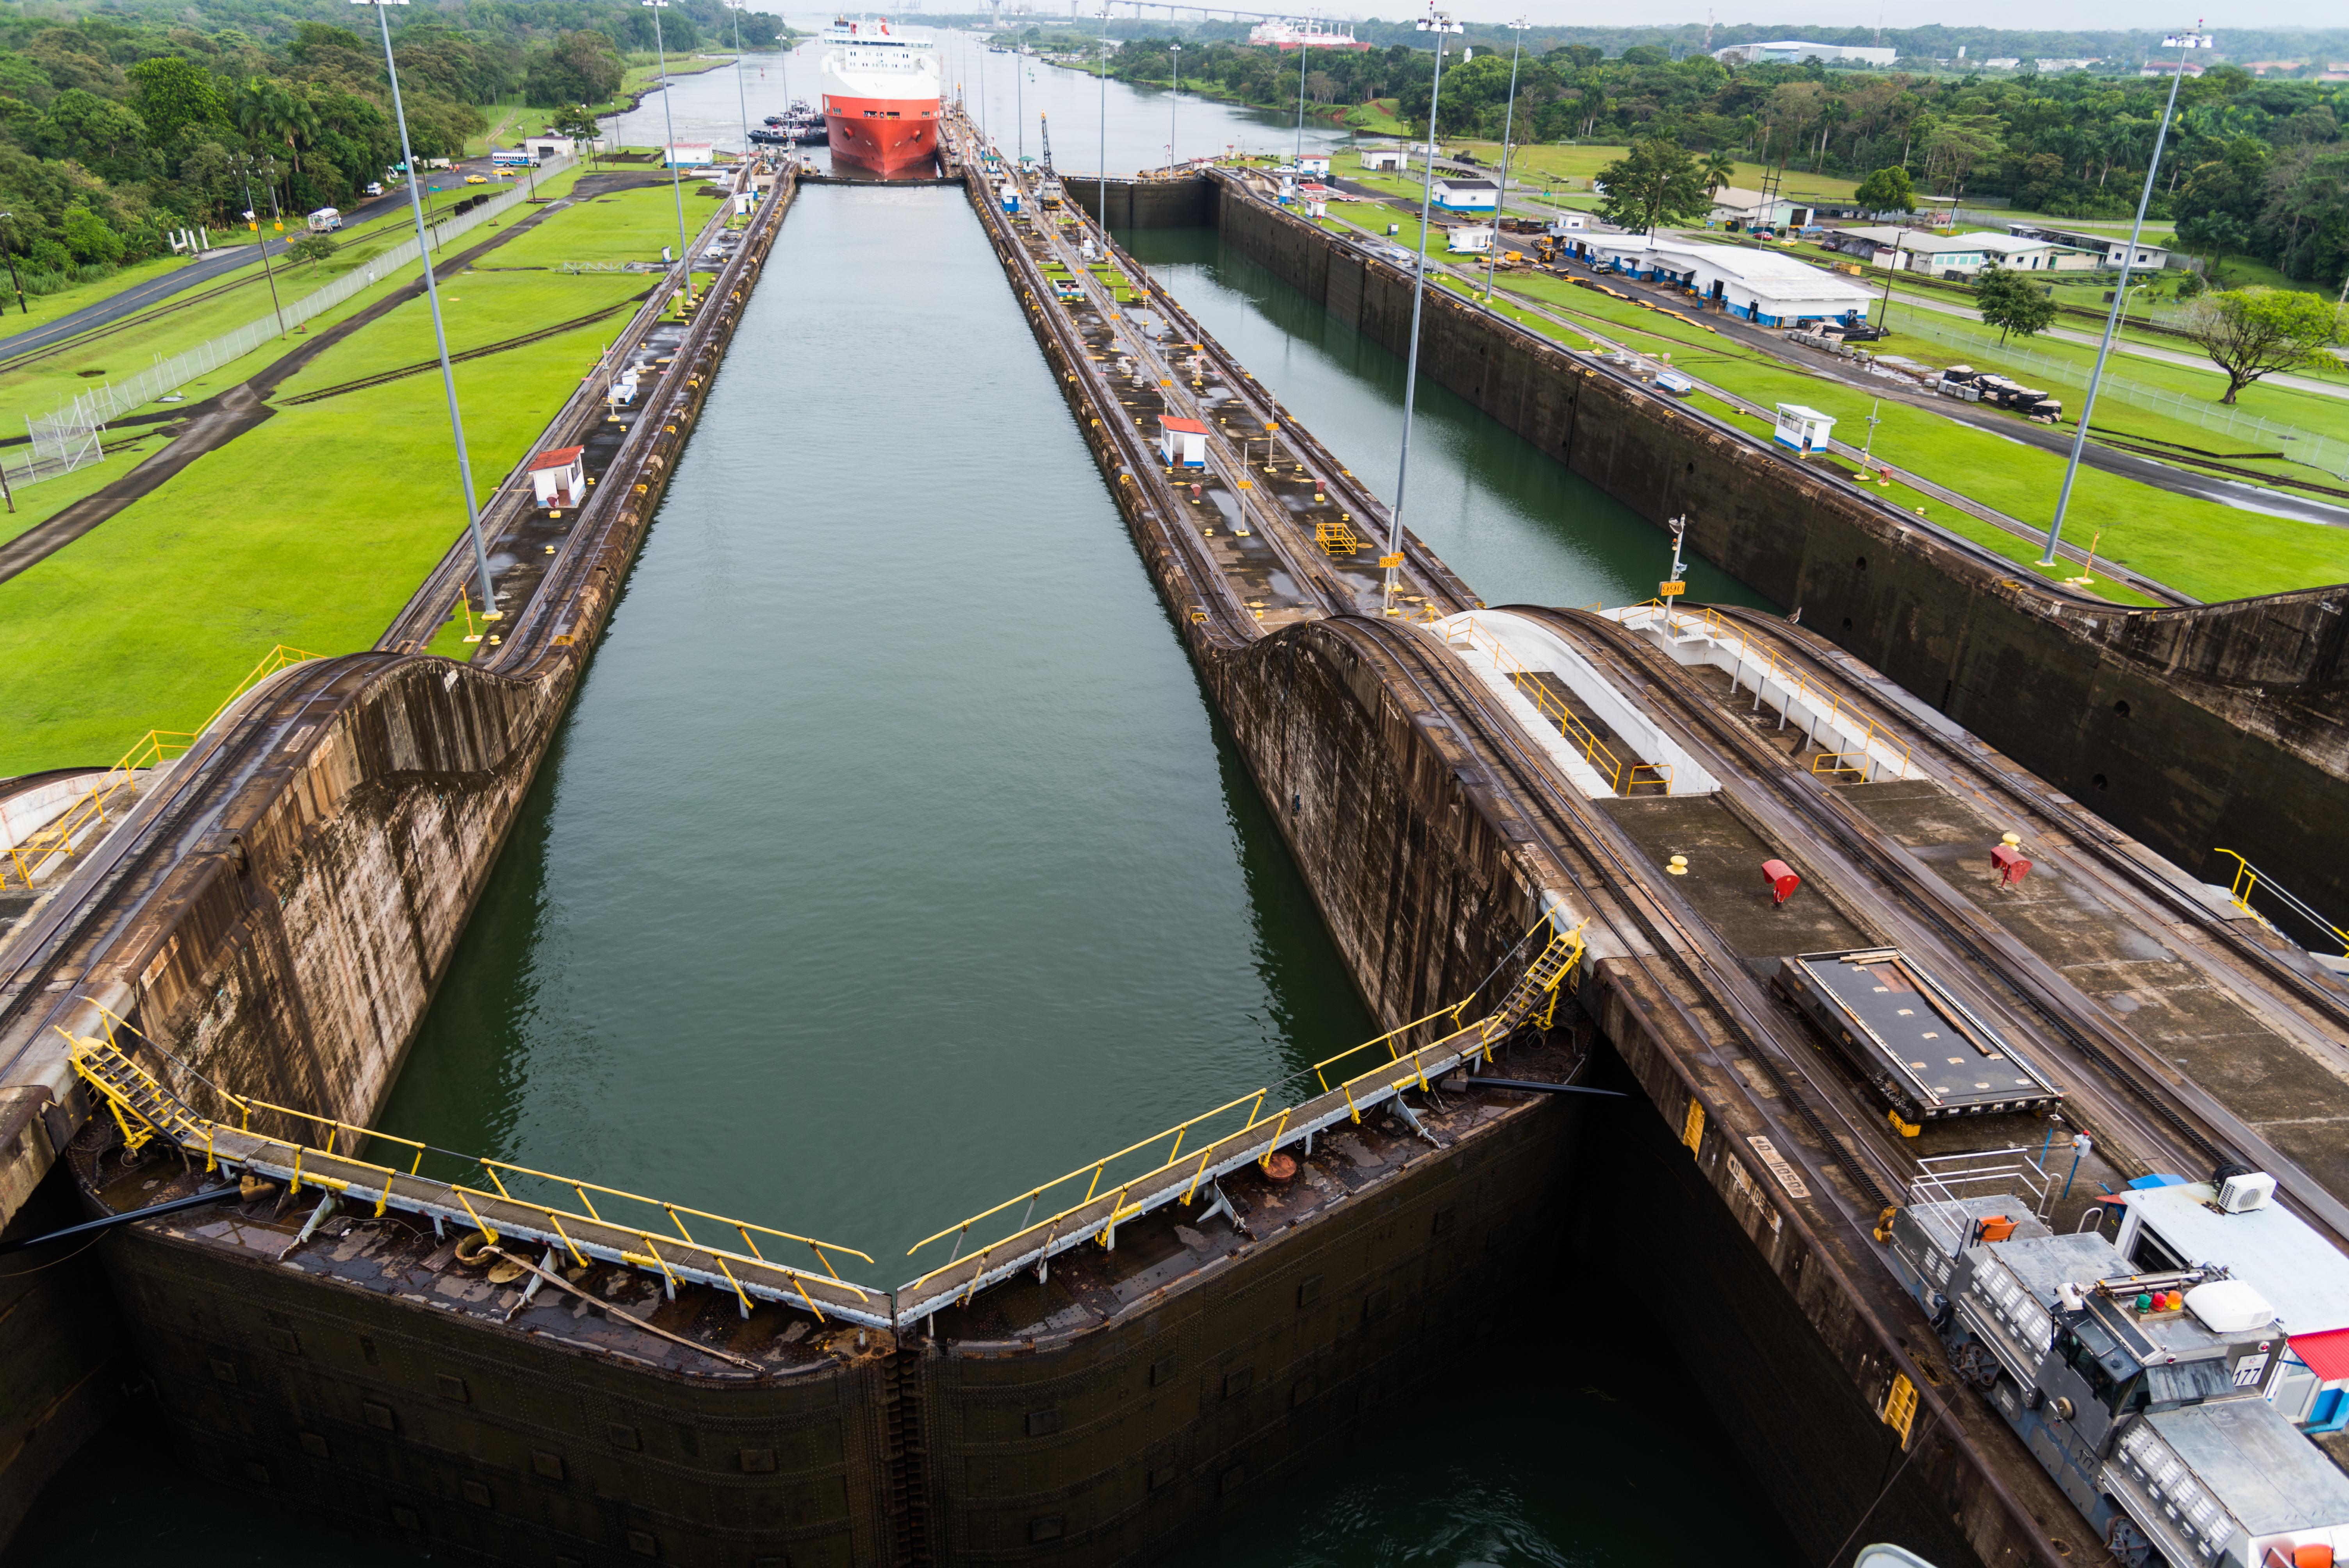 panama canal history